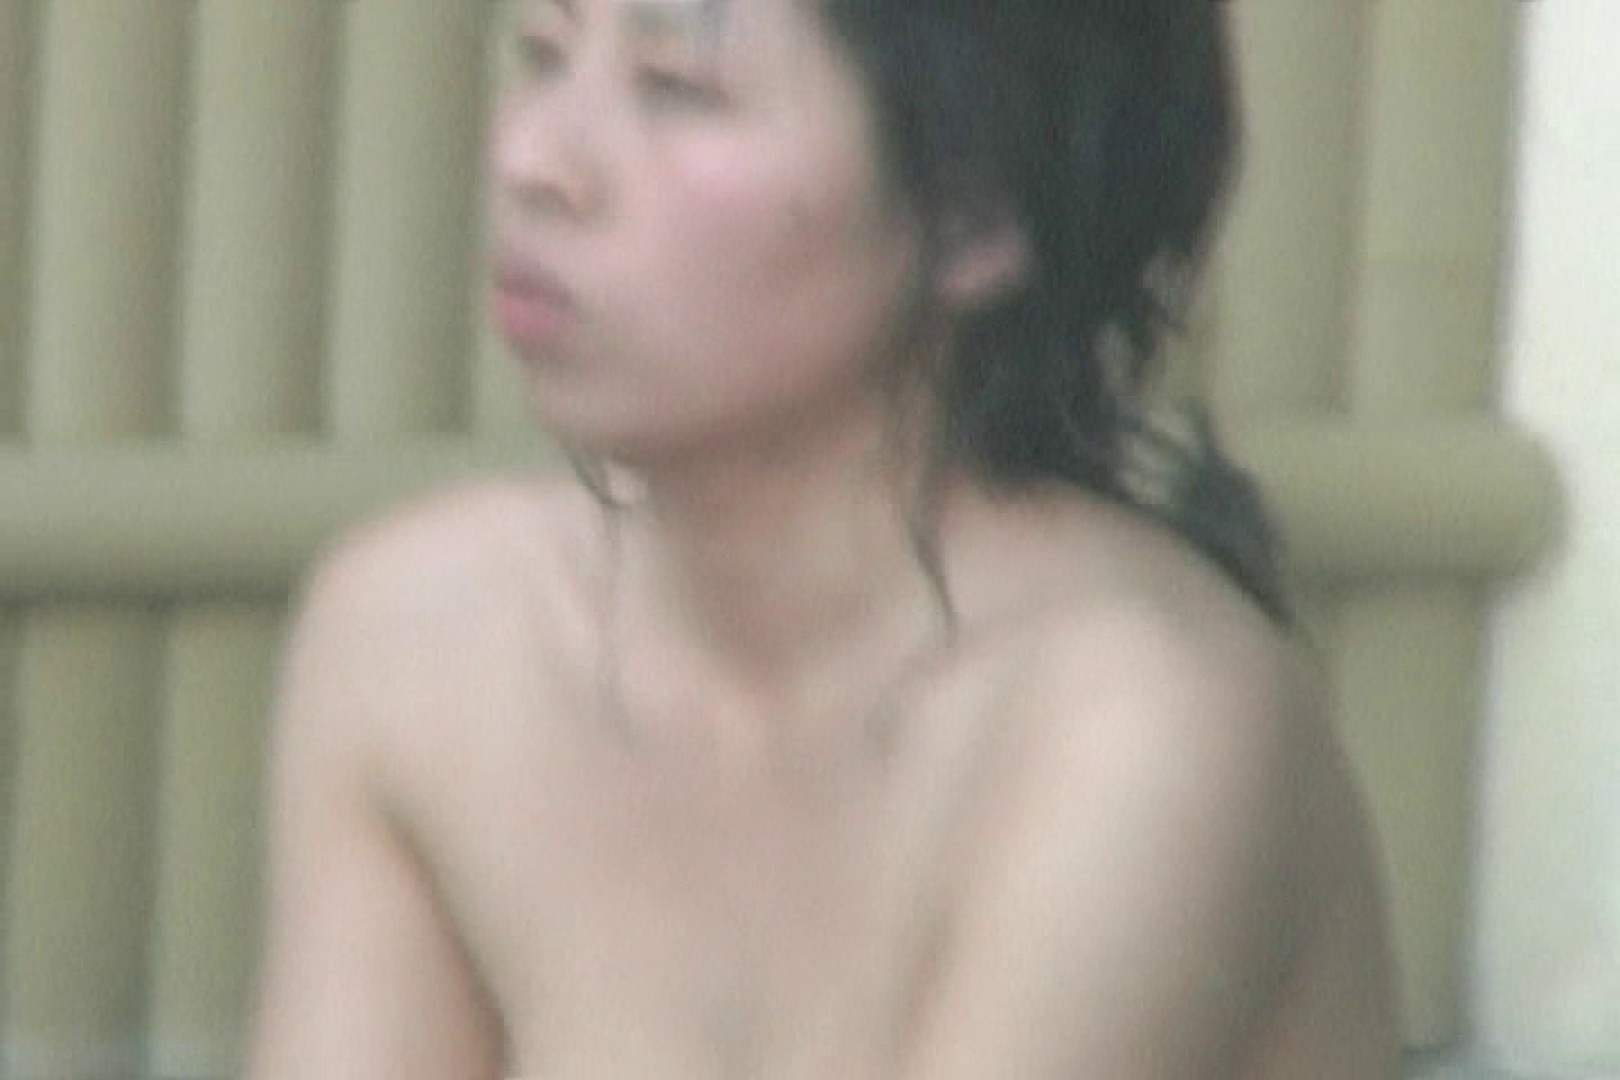 Aquaな露天風呂Vol.589 盗撮 | HなOL  105pic 99